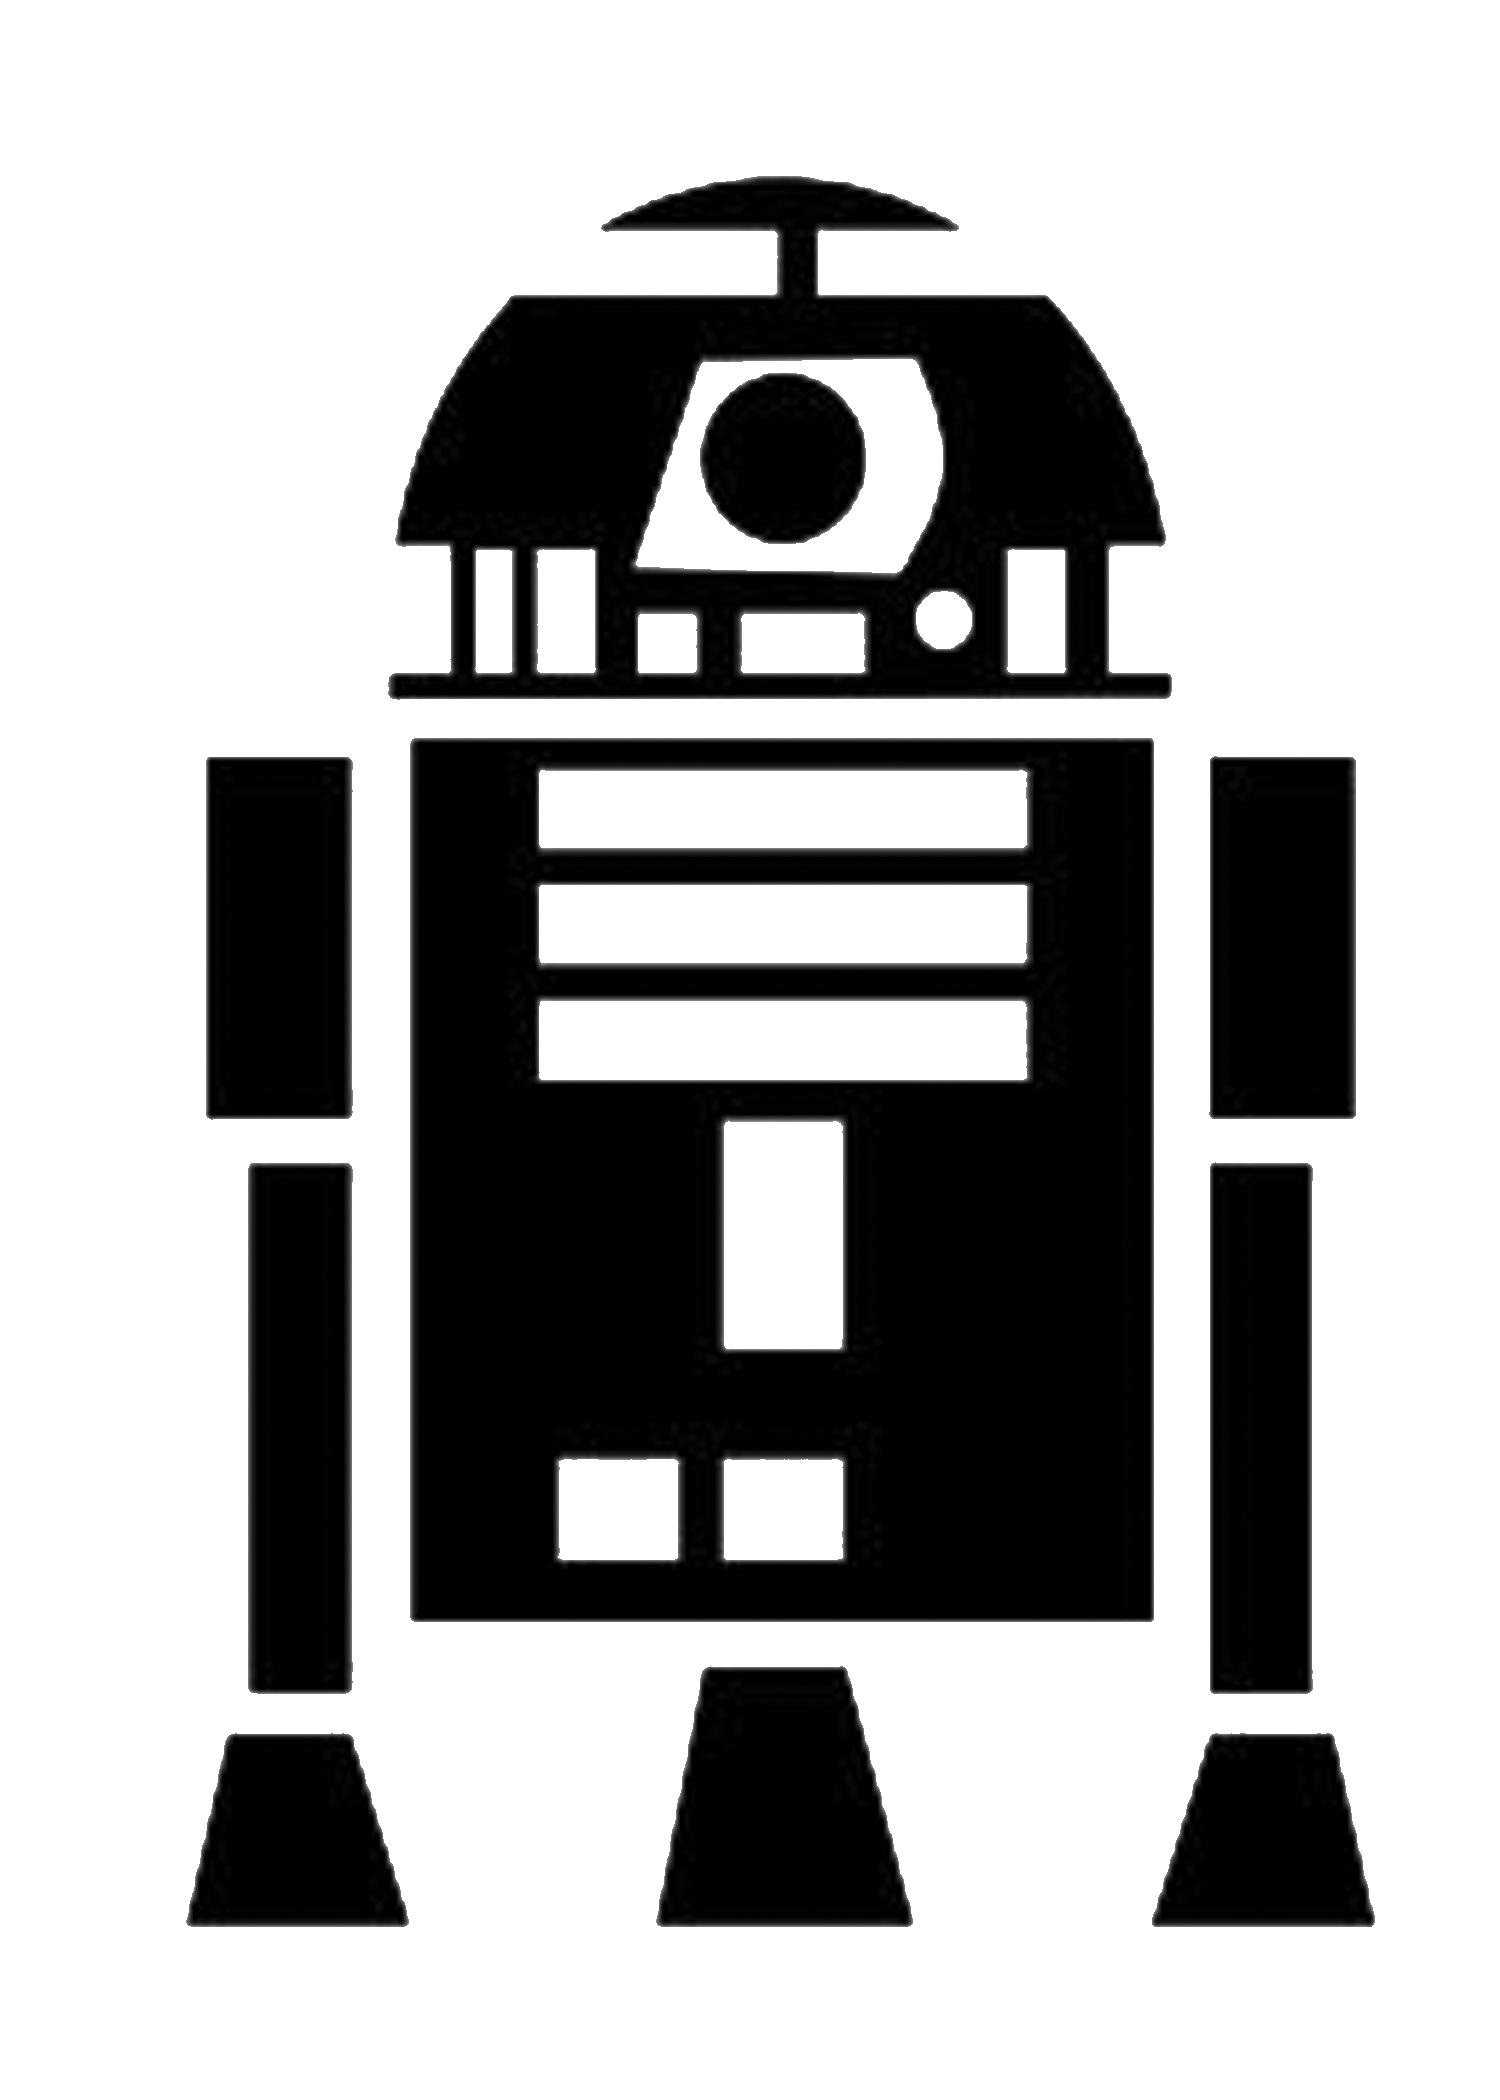 Starwars clipart logo. Star wars wall art